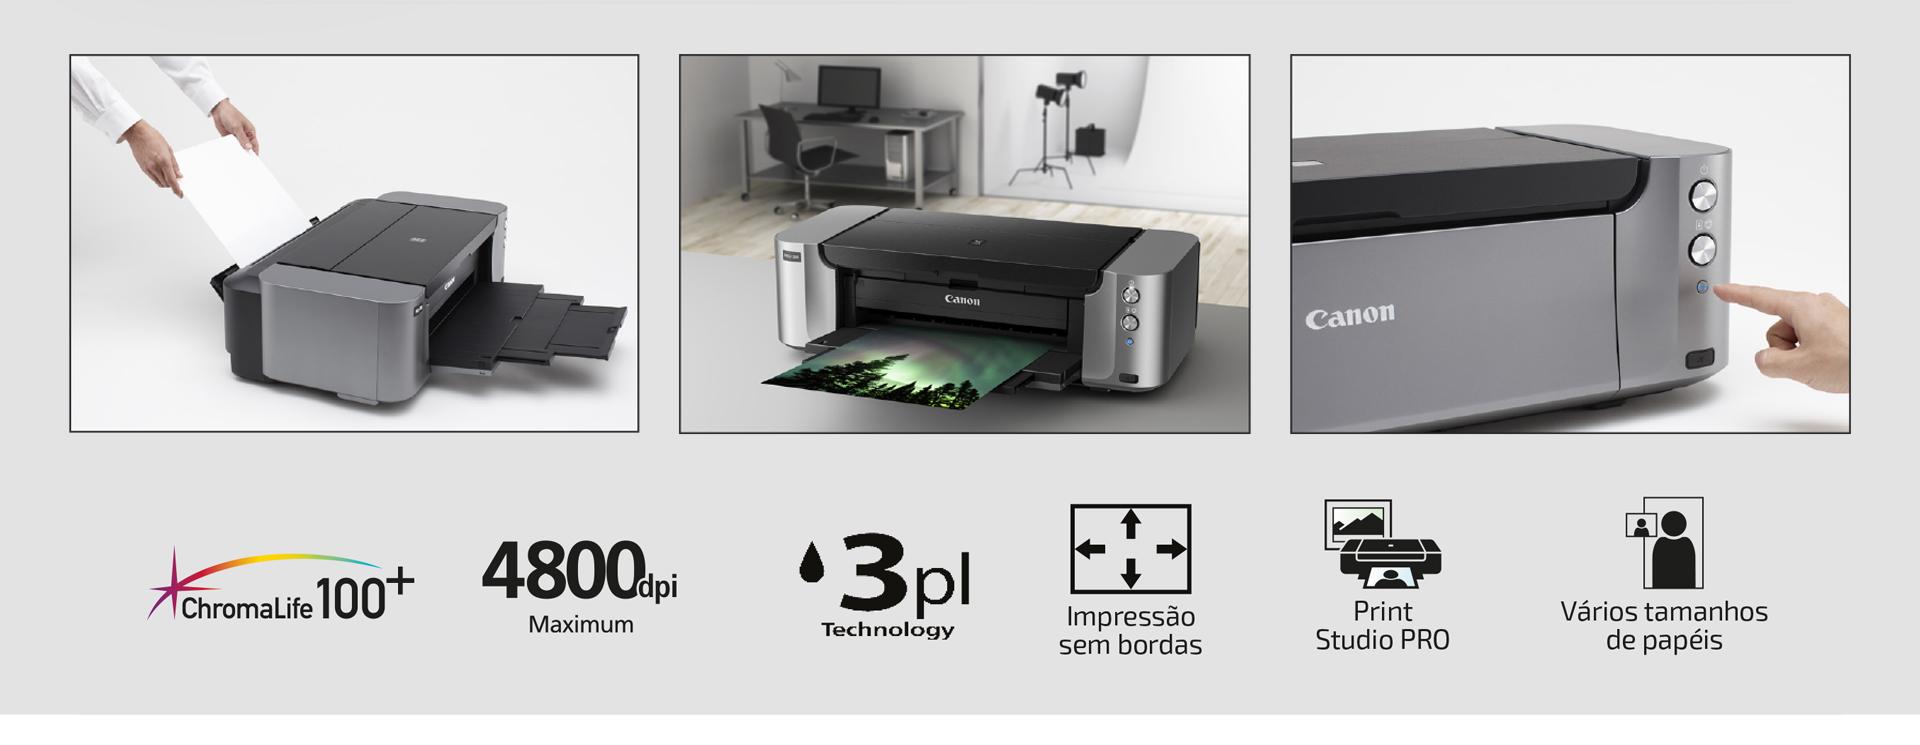 Impressora Fotográfica Jato de Tinta PRO-100 A3+